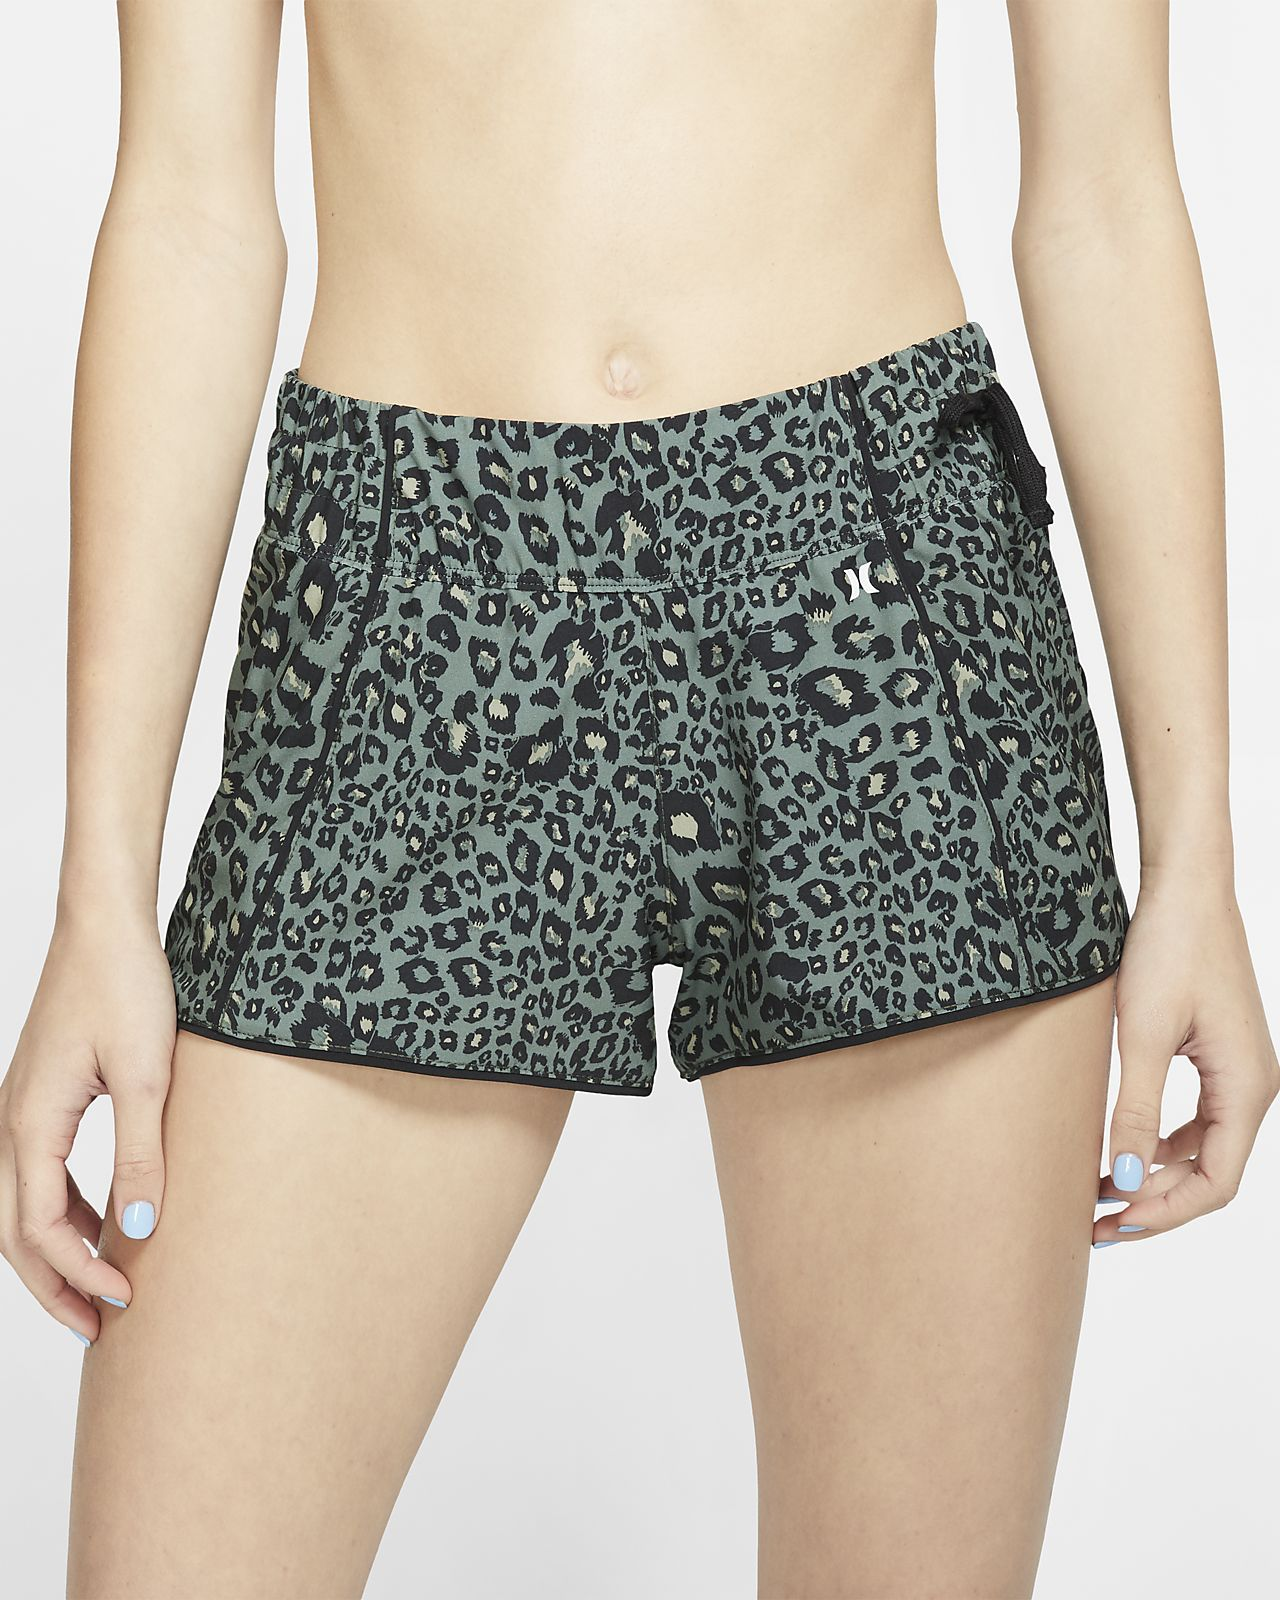 Hurley Phantom Waverider Damen-Boardshorts mit Leopardenmuster